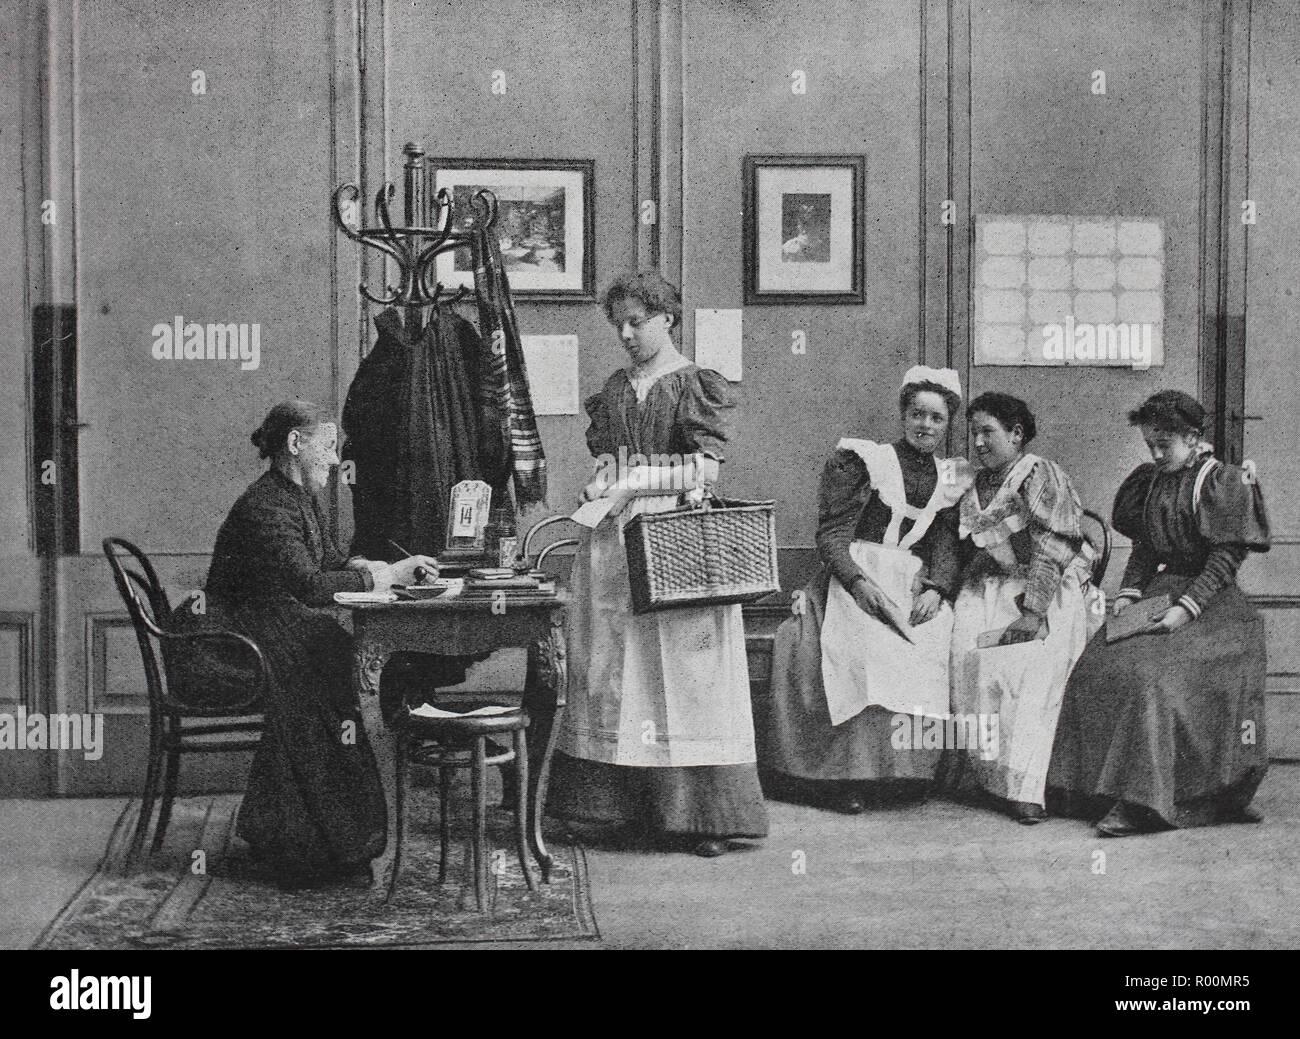 Digital riproduzione migliorata, bei der Zubringerin, originale stampa da l'anno 1899 Immagini Stock